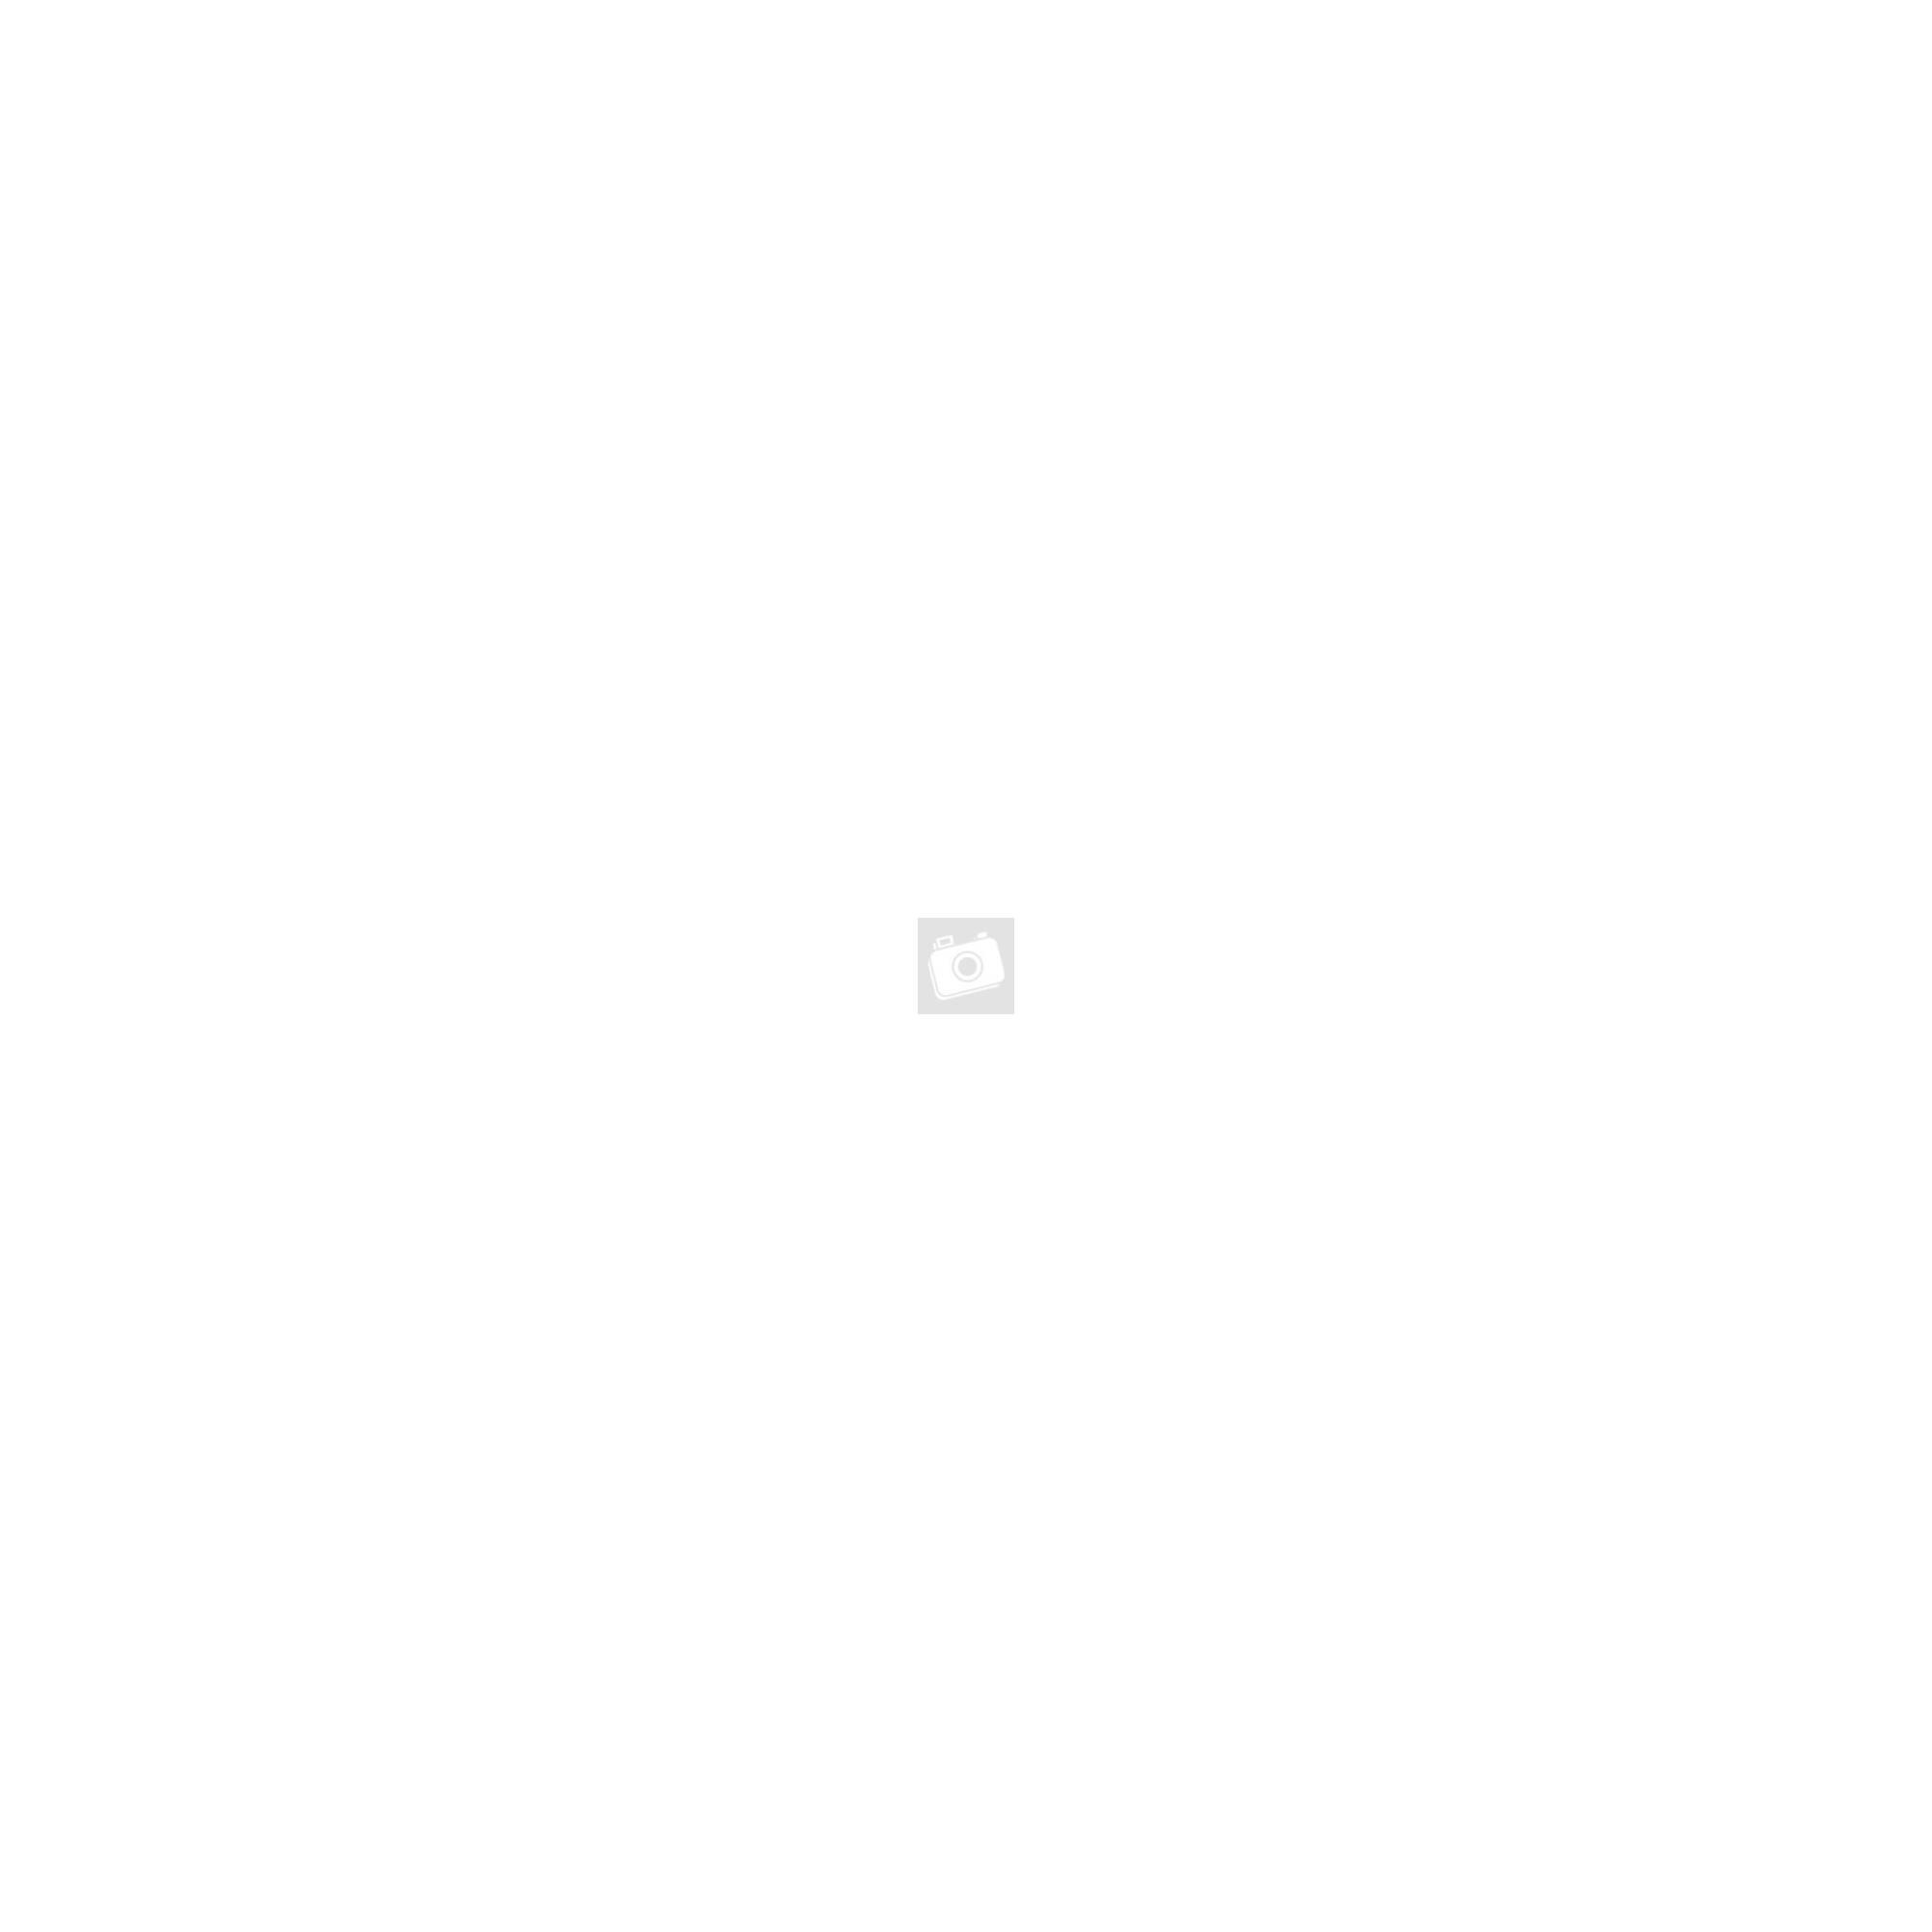 833c93c9ab CIPO AND BAXX - SIMPLE#KILL - Férfi átmeneti kabát - Prémium kategória